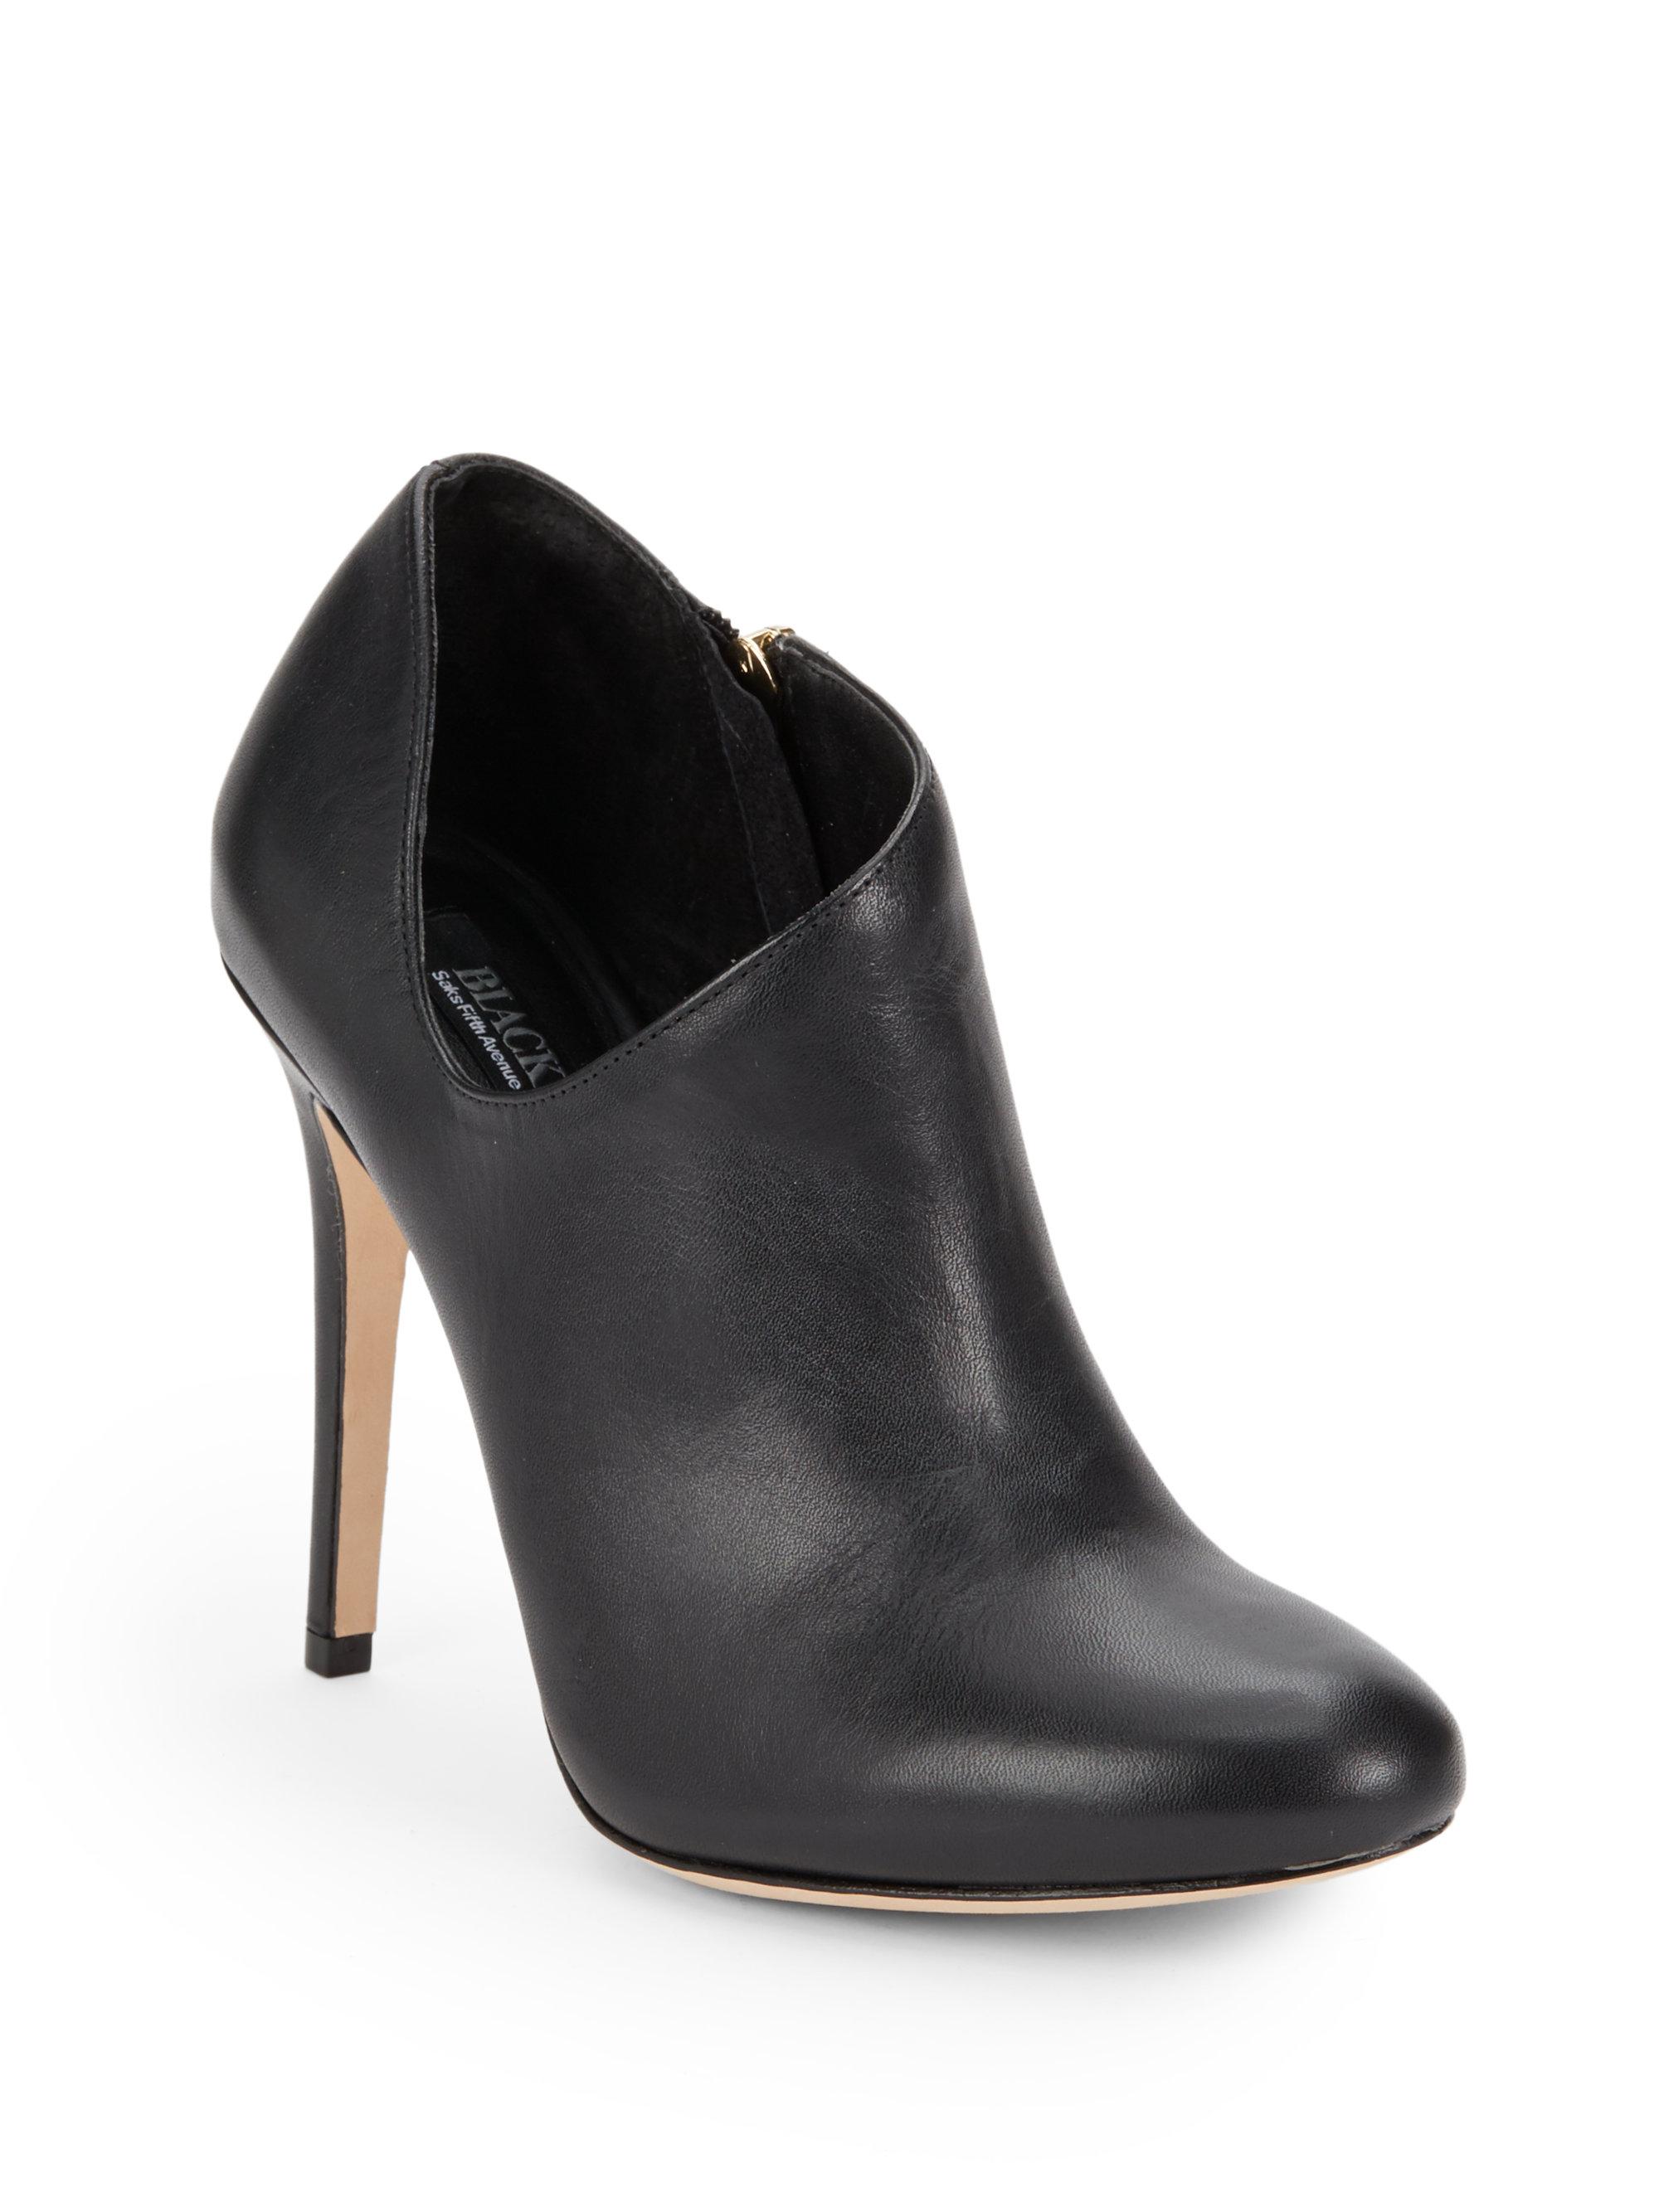 saks fifth avenue black label brinda suede ankle boots in